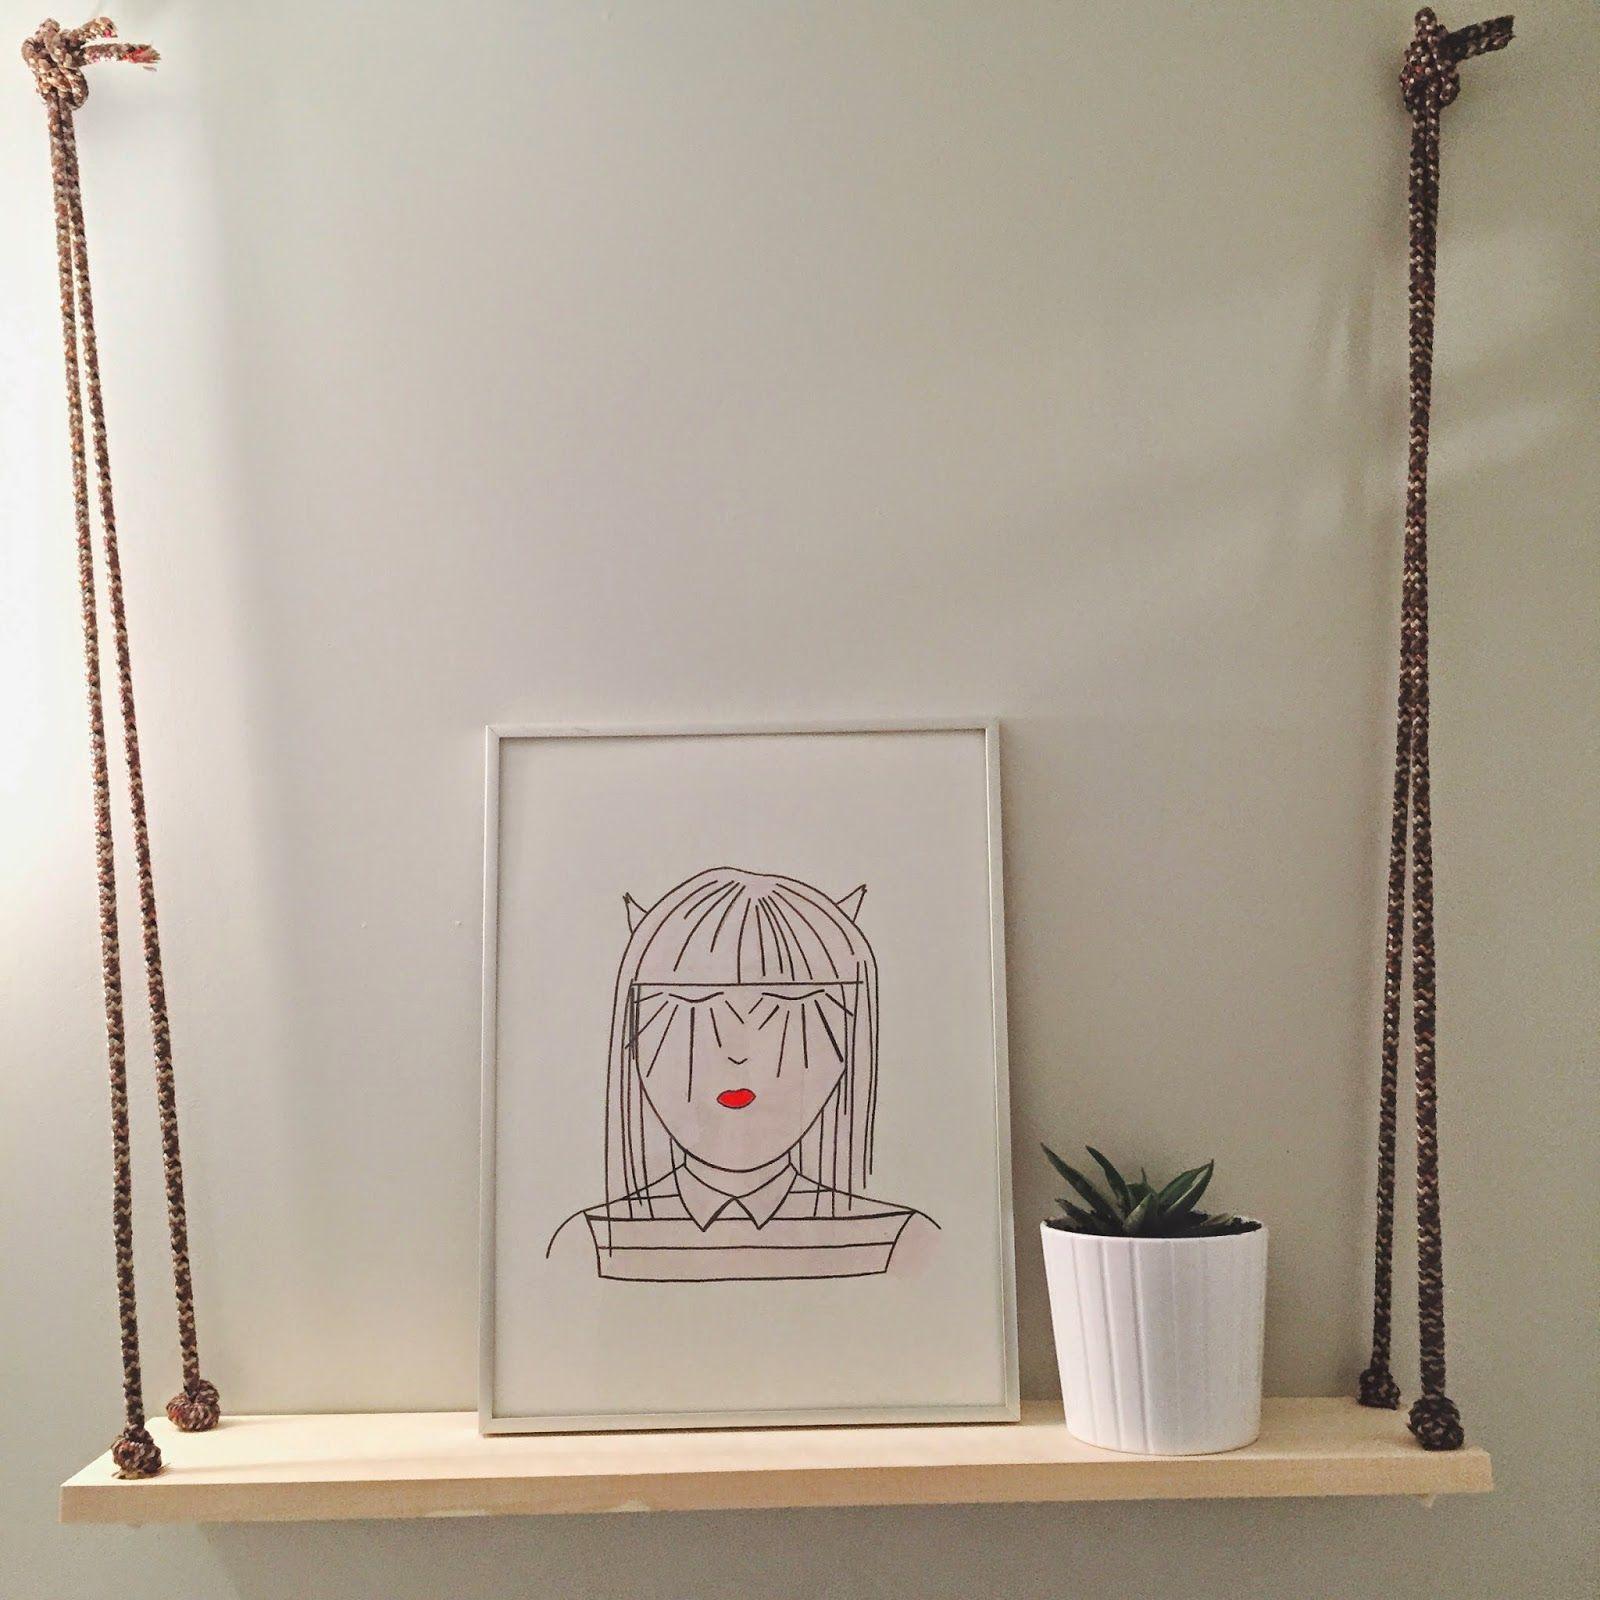 Hanging Shelf (DIY)